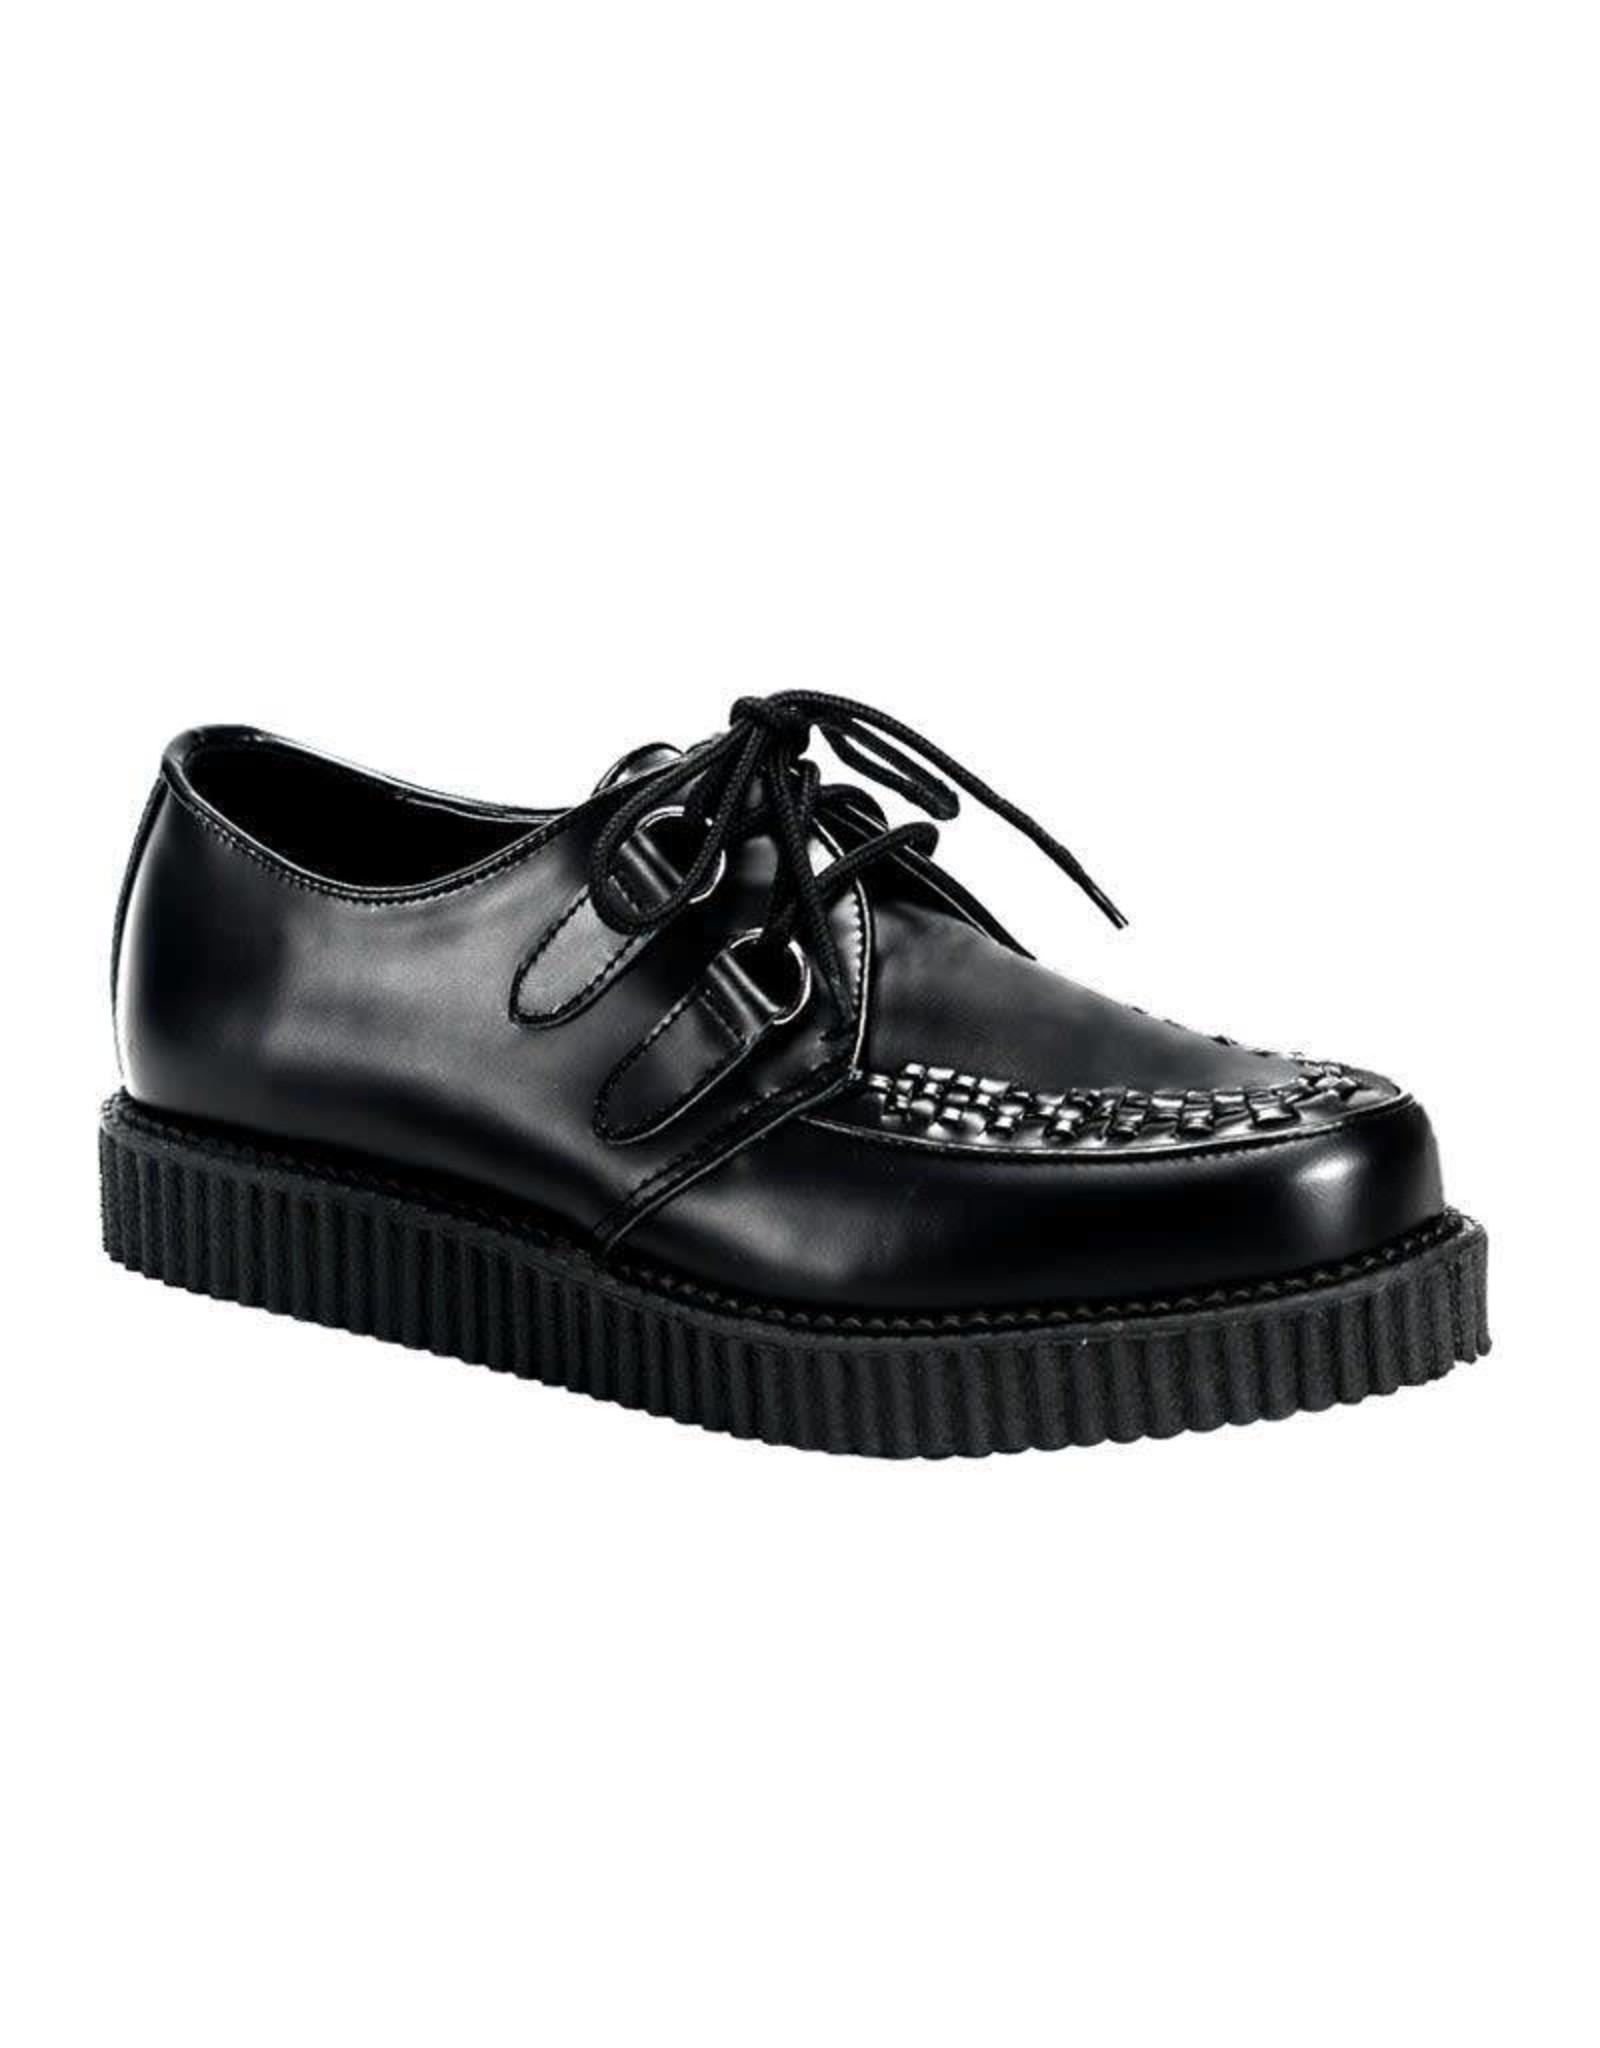 "DEMONIA CREEPER-602 1"" Platform Black Leather Creeper-D1B"